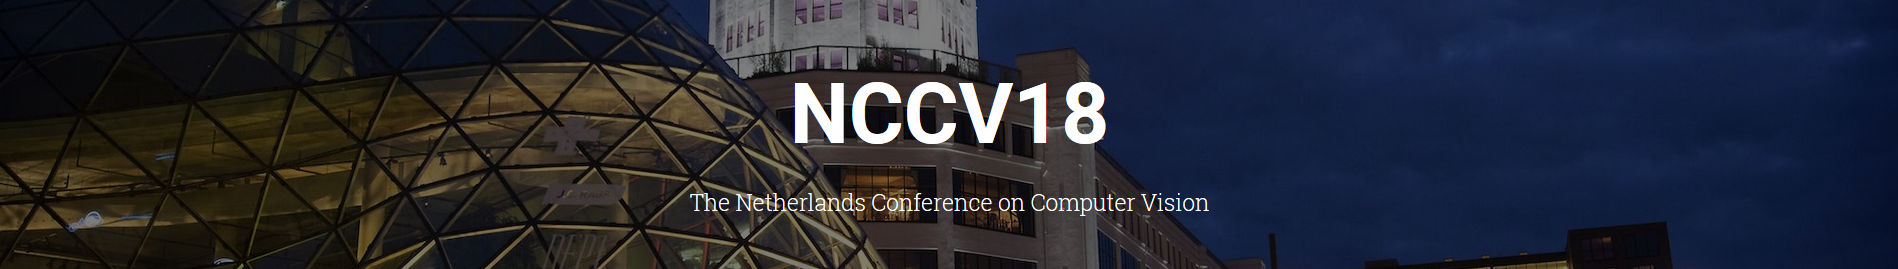 NCCV 2018